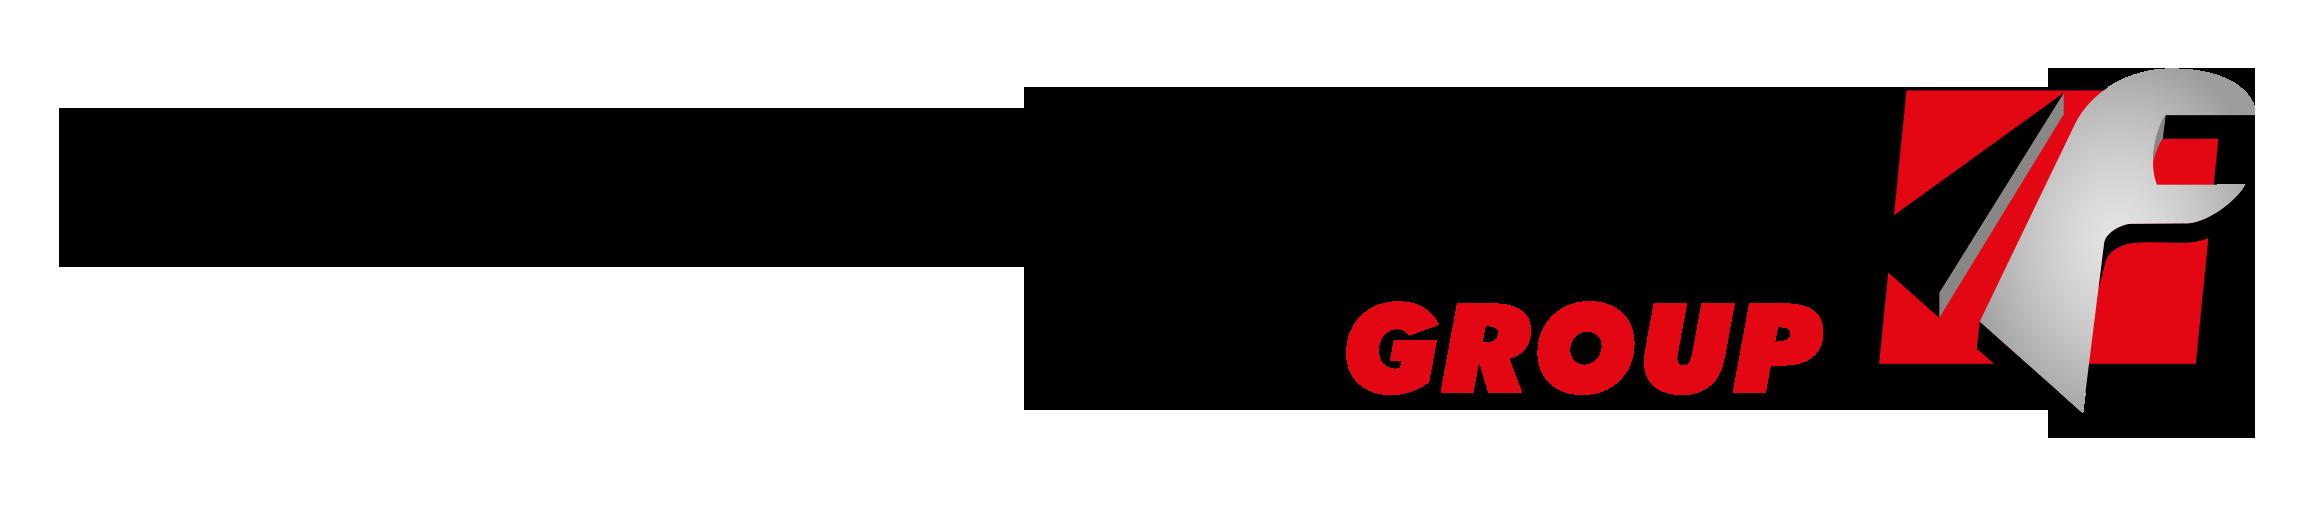 Faymonville Group